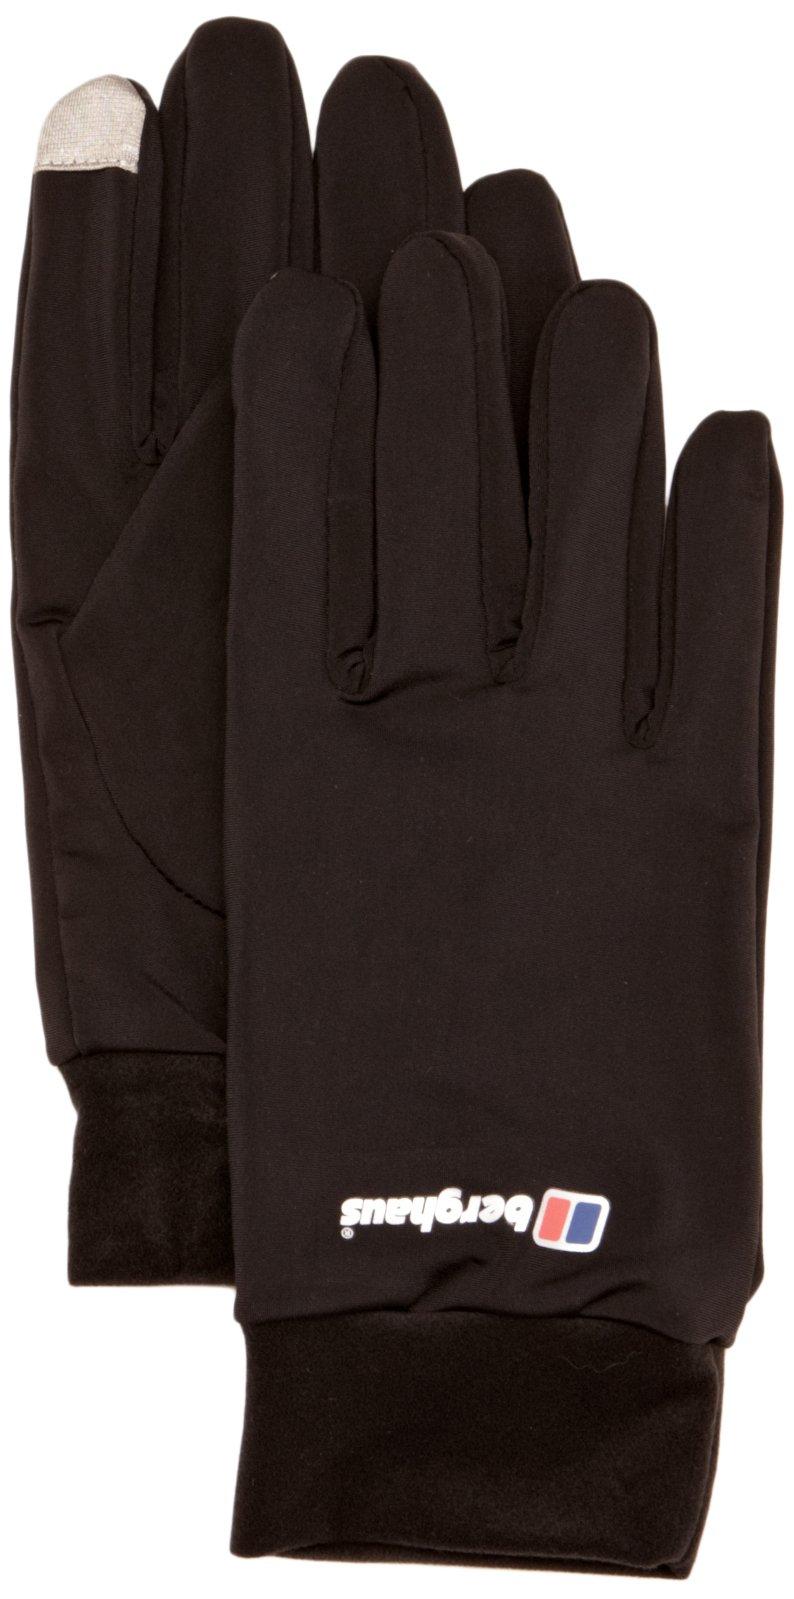 Berghaus Erwachsene Handschuhe Berg Liner Gloves AU, Black, M